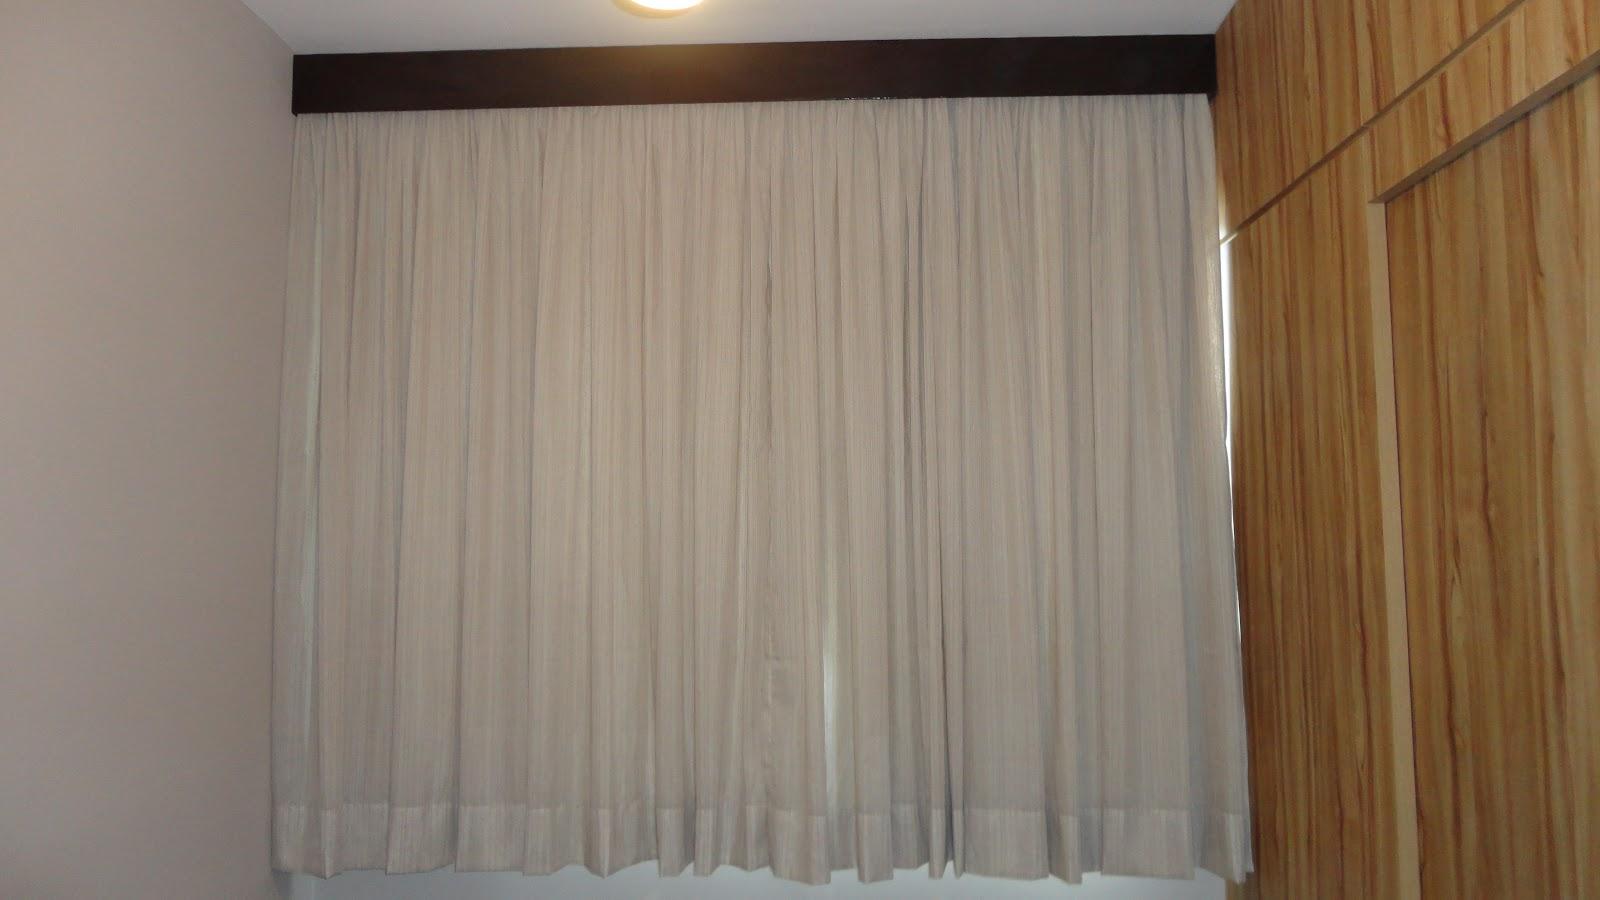 Cortinas bandos car interior design - Bandos para cortinas ...